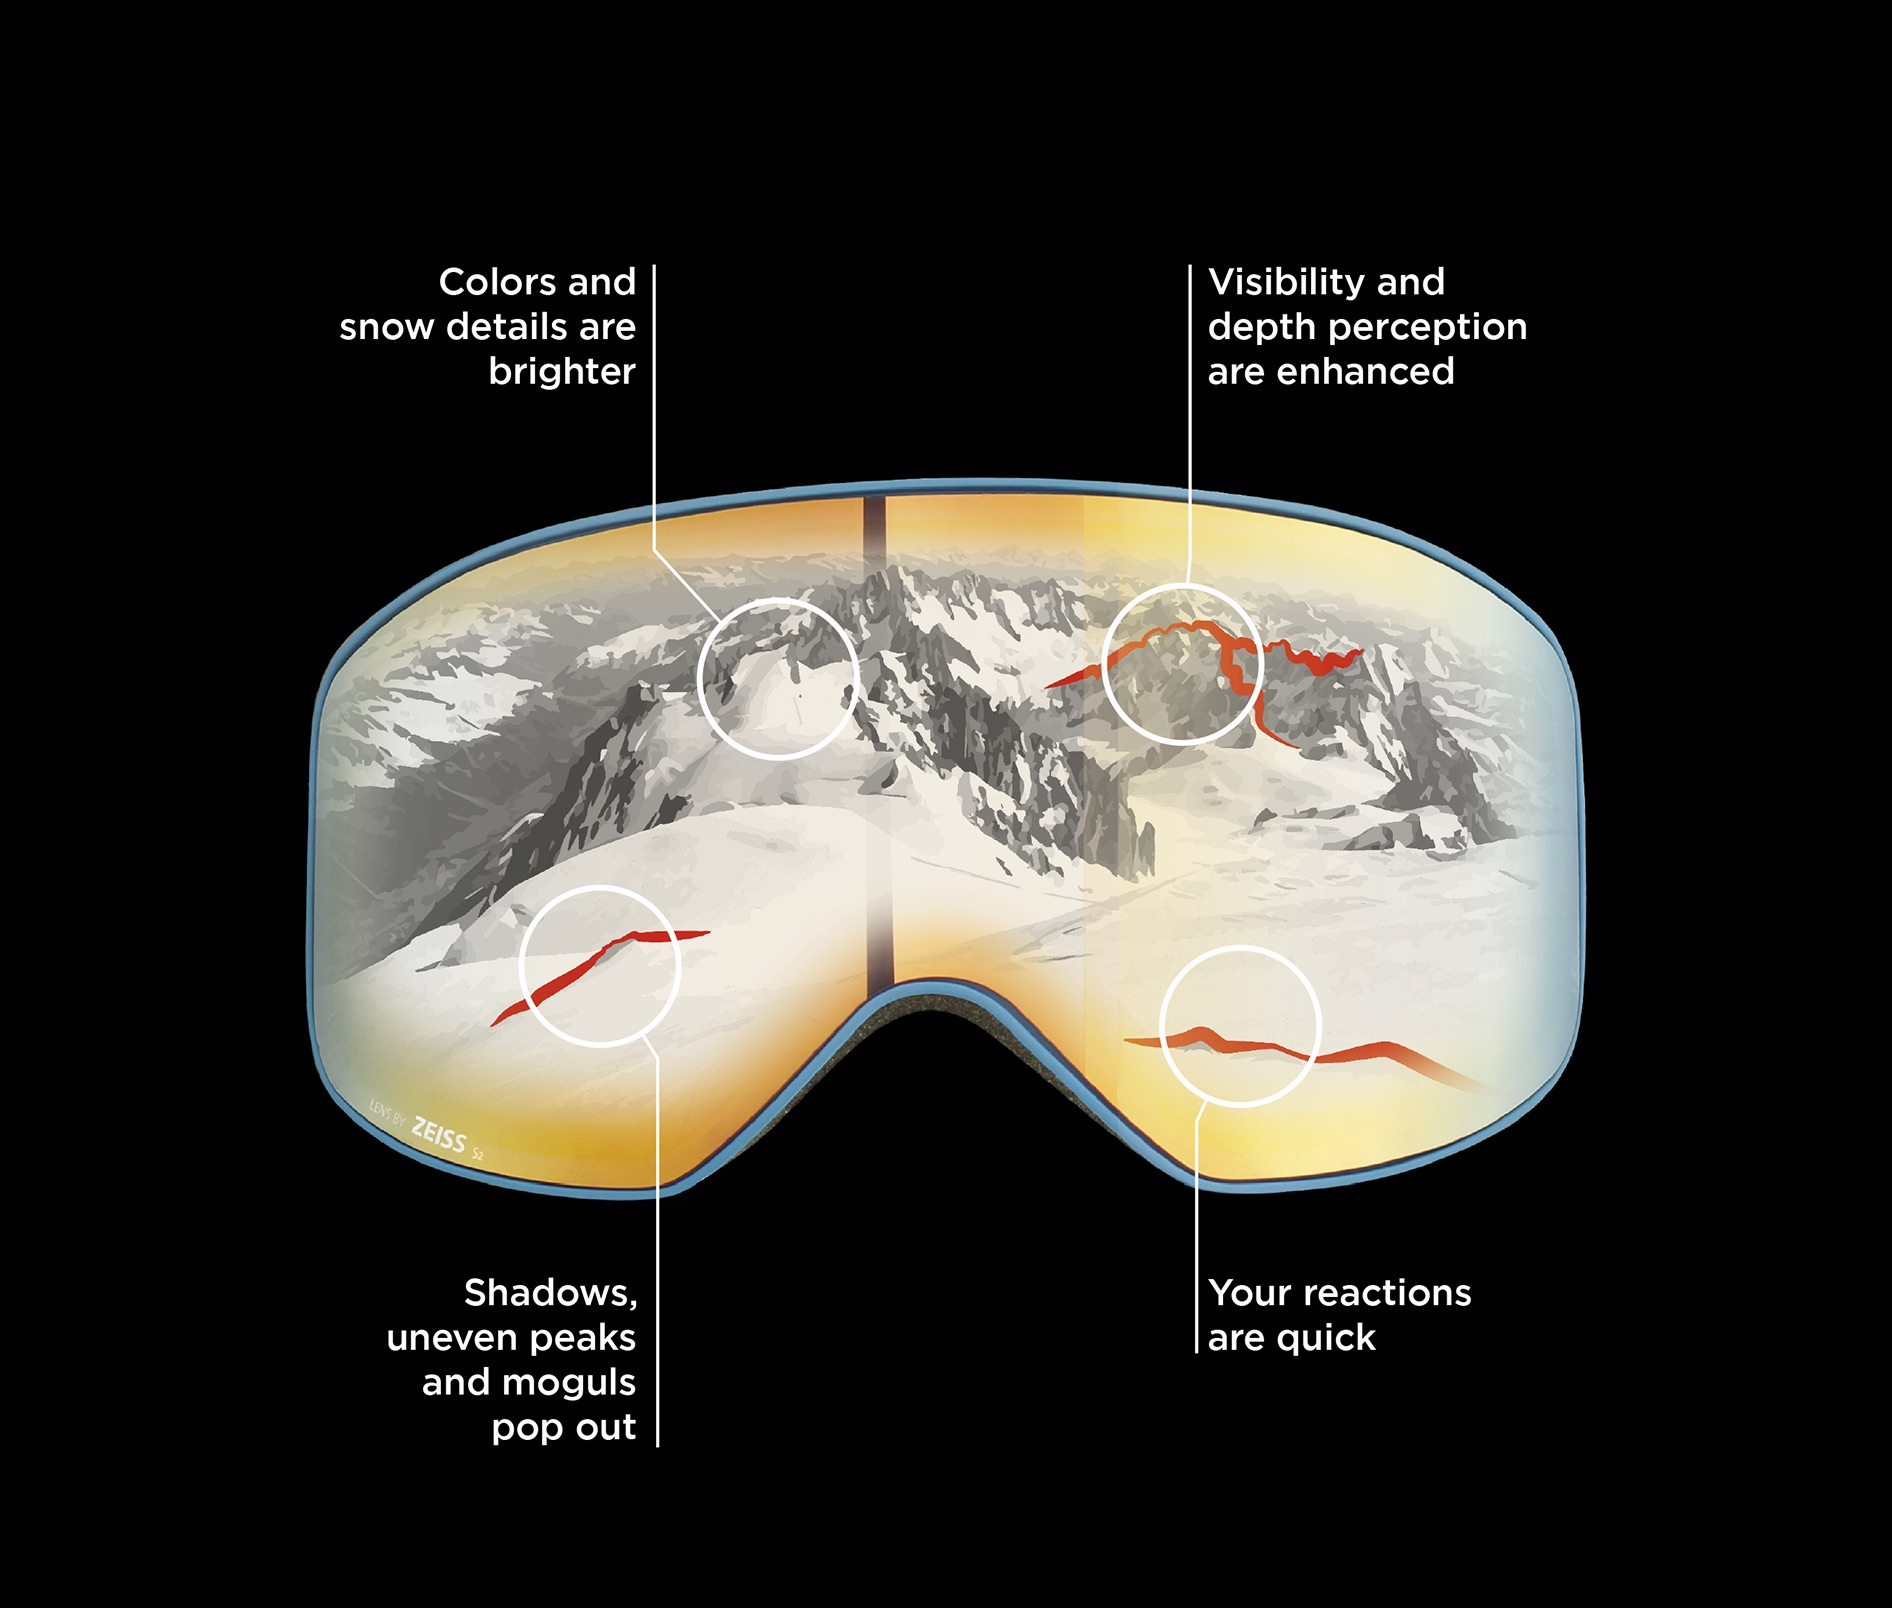 Копия_zeiss-sonar-infographic_d26b0f72784c5b6c01fb25ce6878f513.jpg